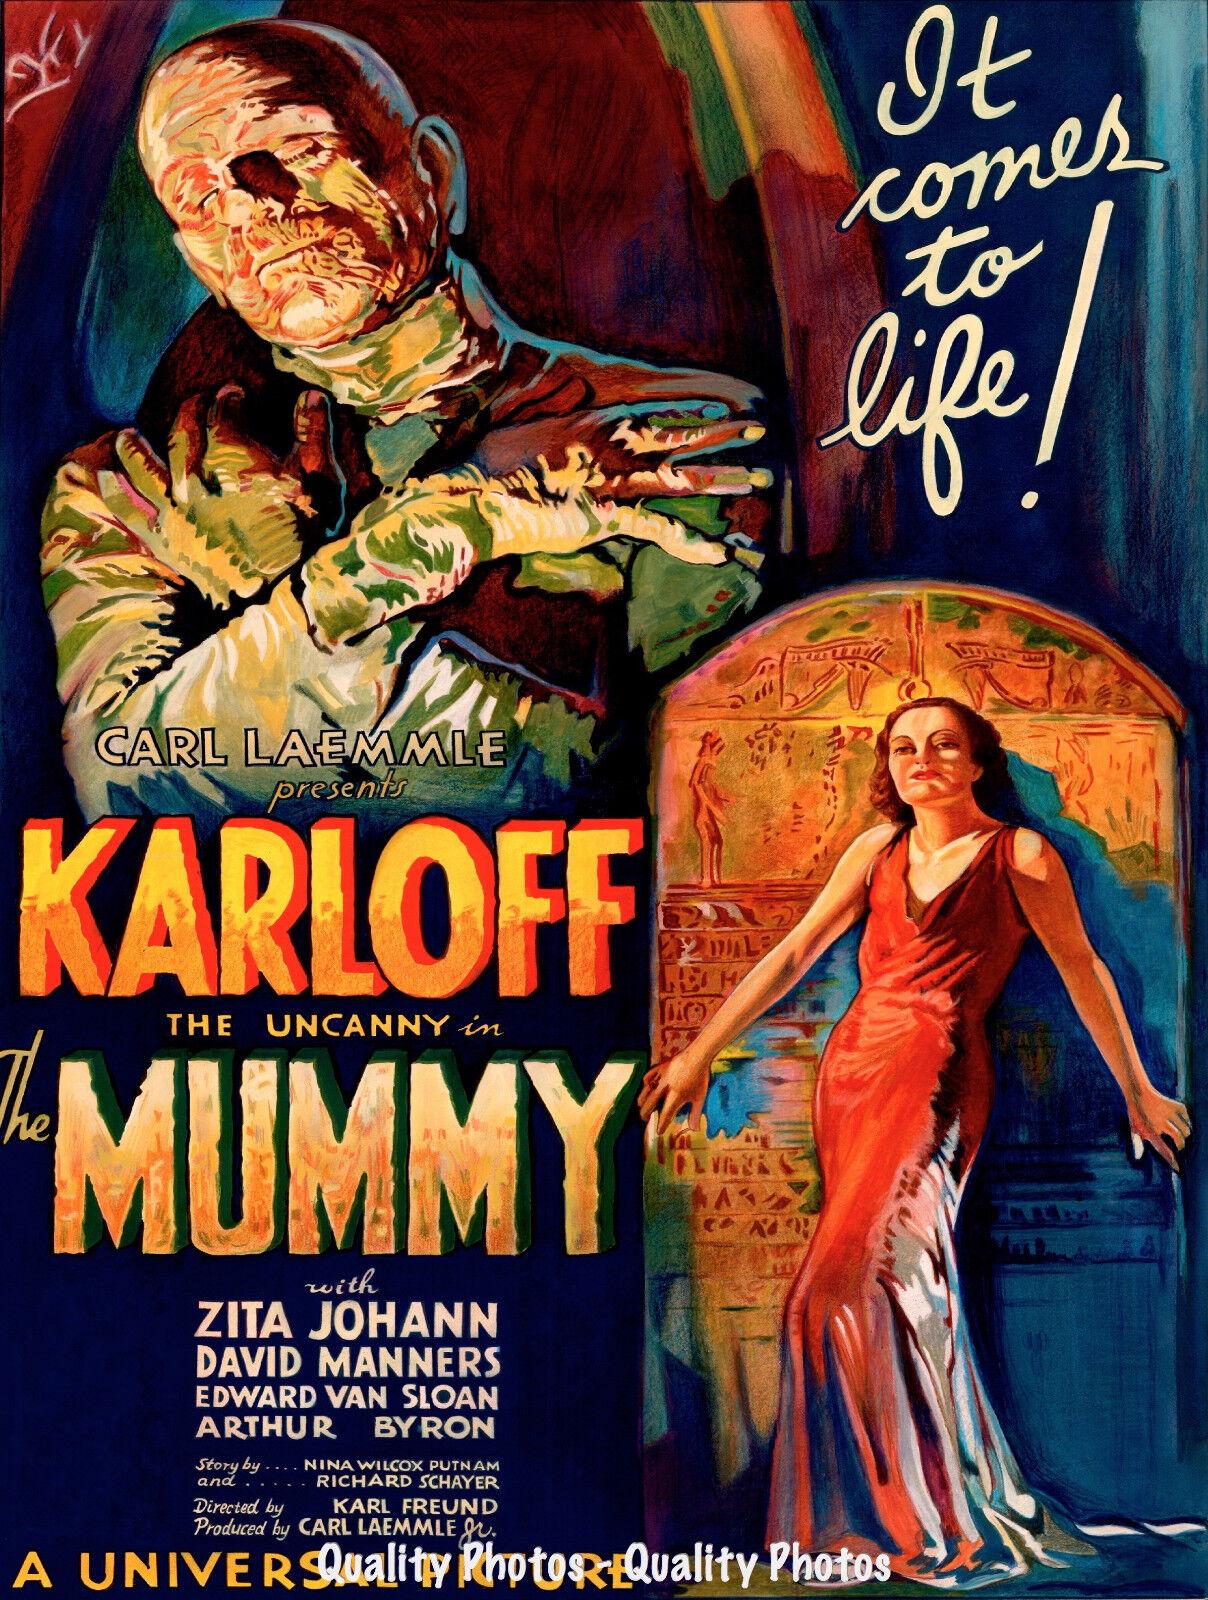 1932 THE MUMMY WITH BORIS KARLOFF VINTAGE HORROR MOVIE POSTER PRINT 36x24 9 MIL